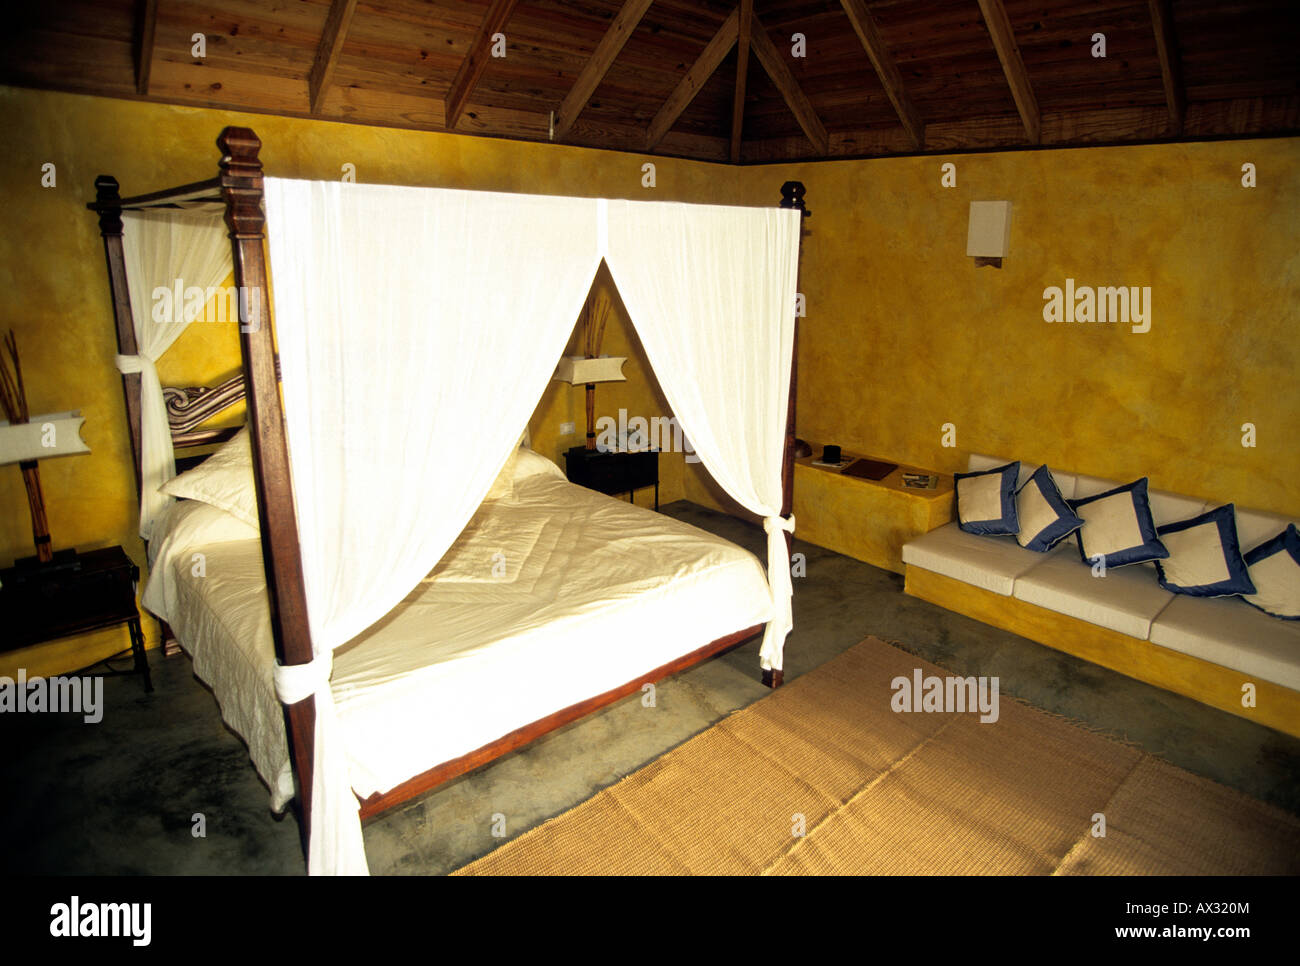 caribbean grenada island an up market hotel room - Stock Image